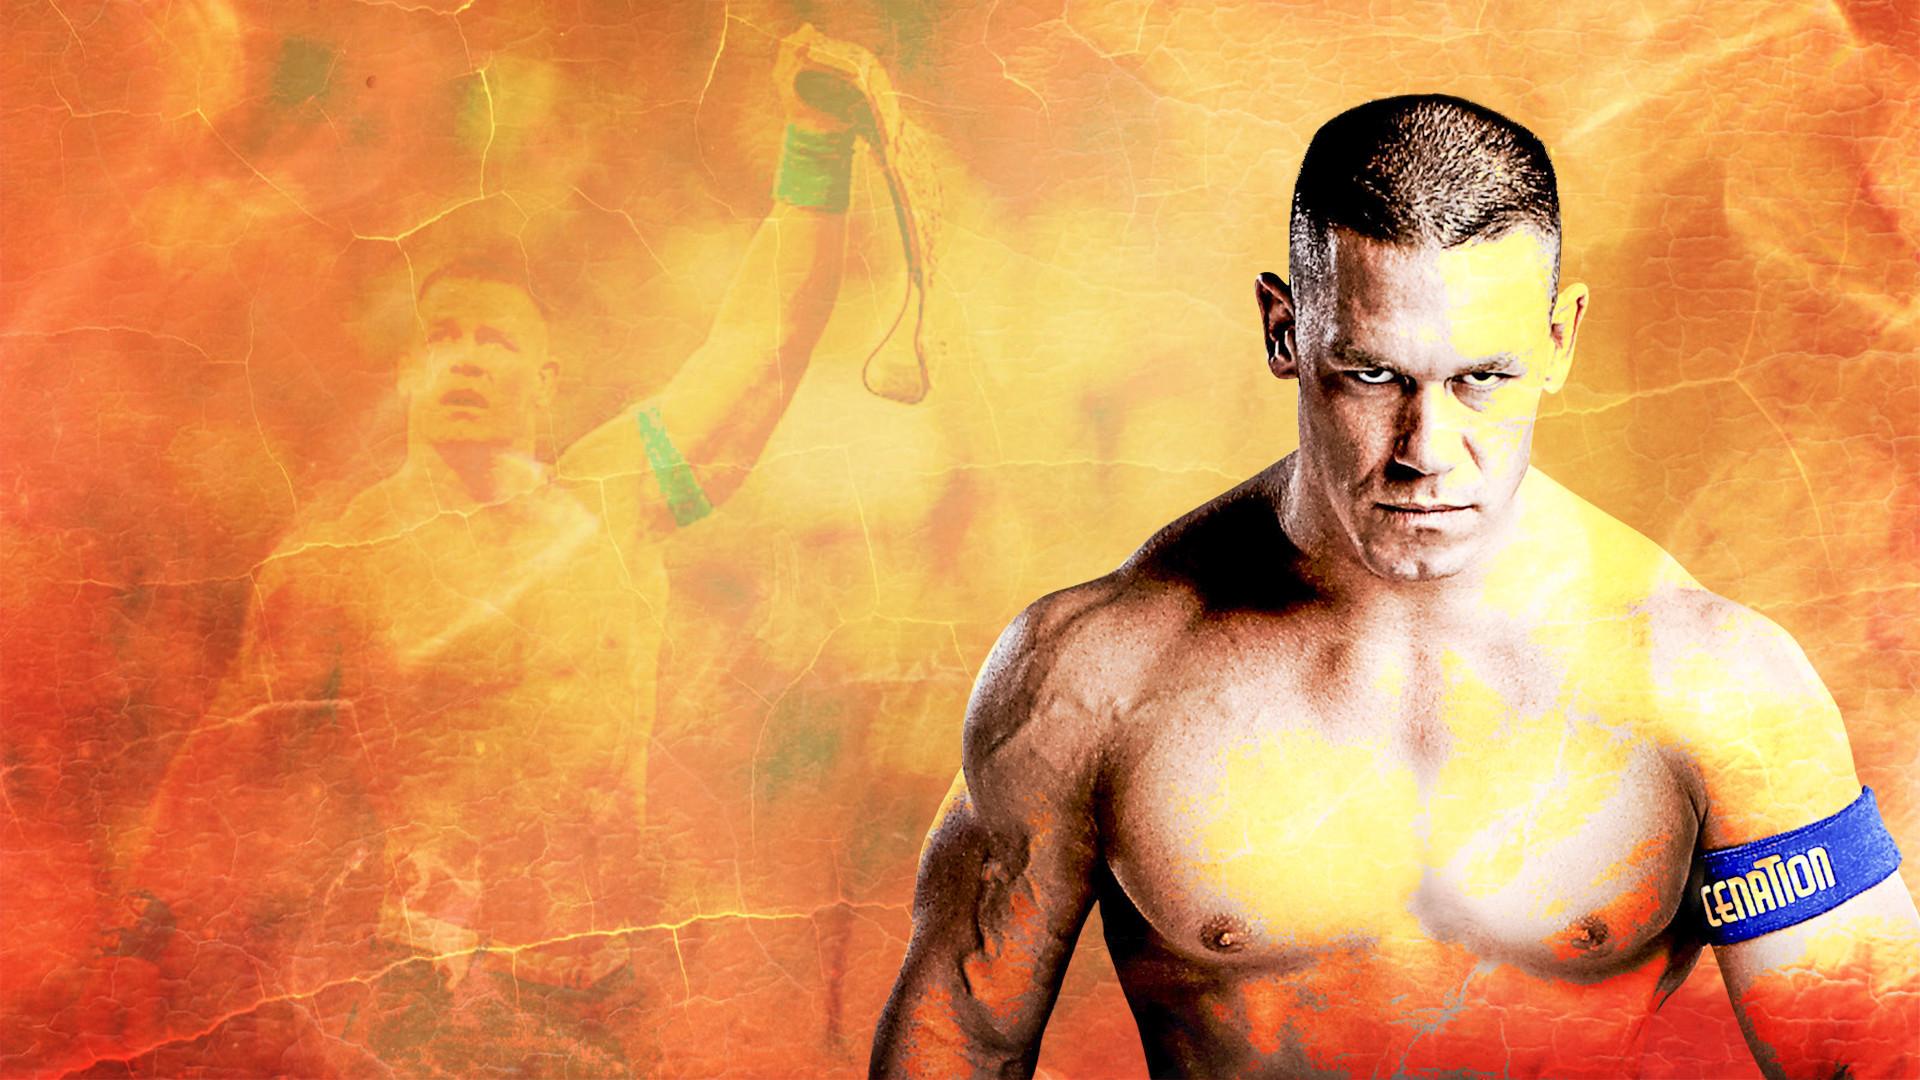 John Cena Wallpaper 2018 Hd 45 Images